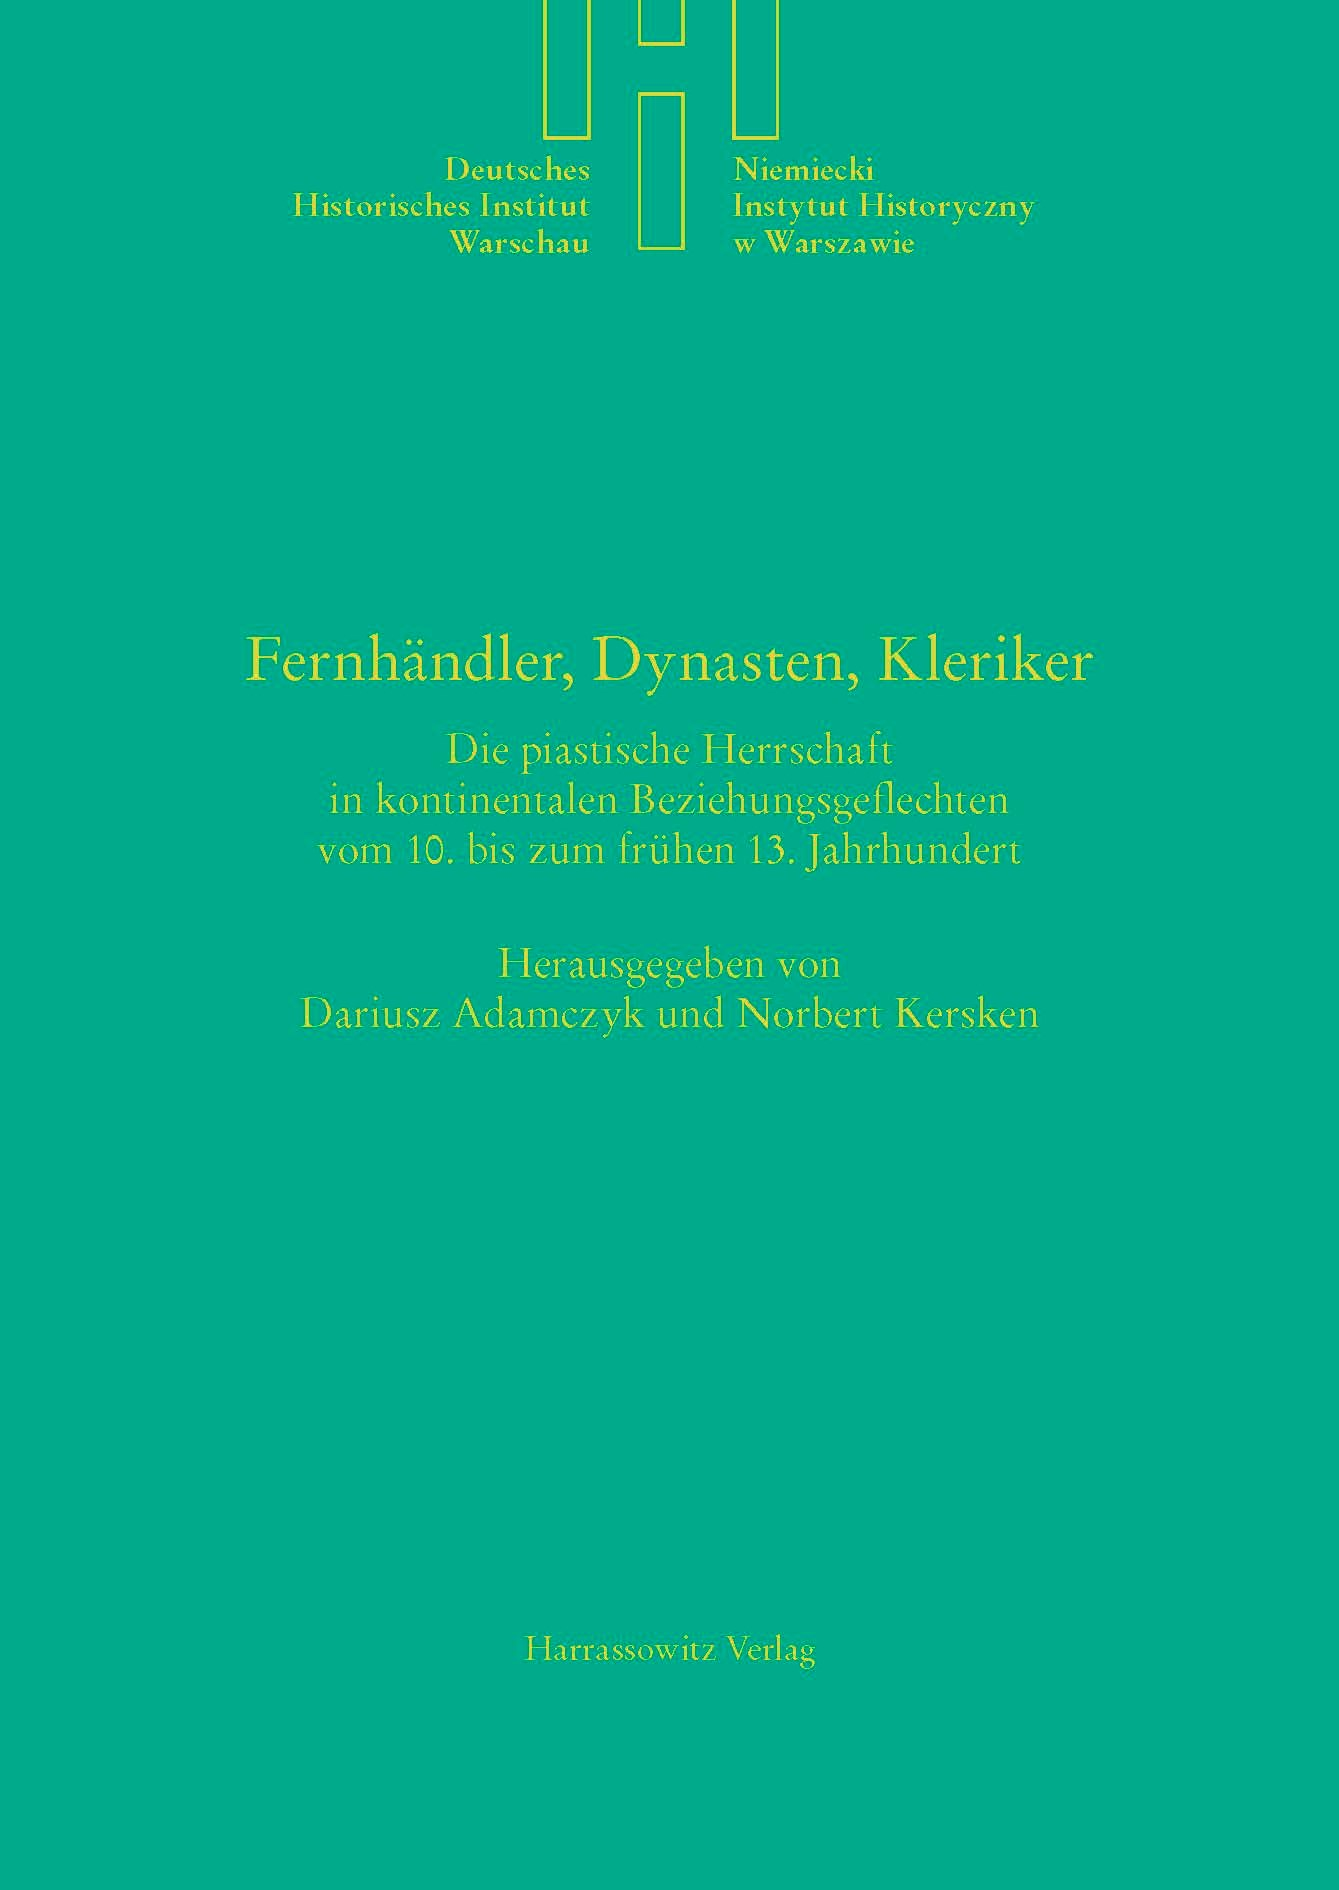 Fernhändler, Dynasten, Kleriker | Adamczyk / Kersken, 2015 | Buch (Cover)